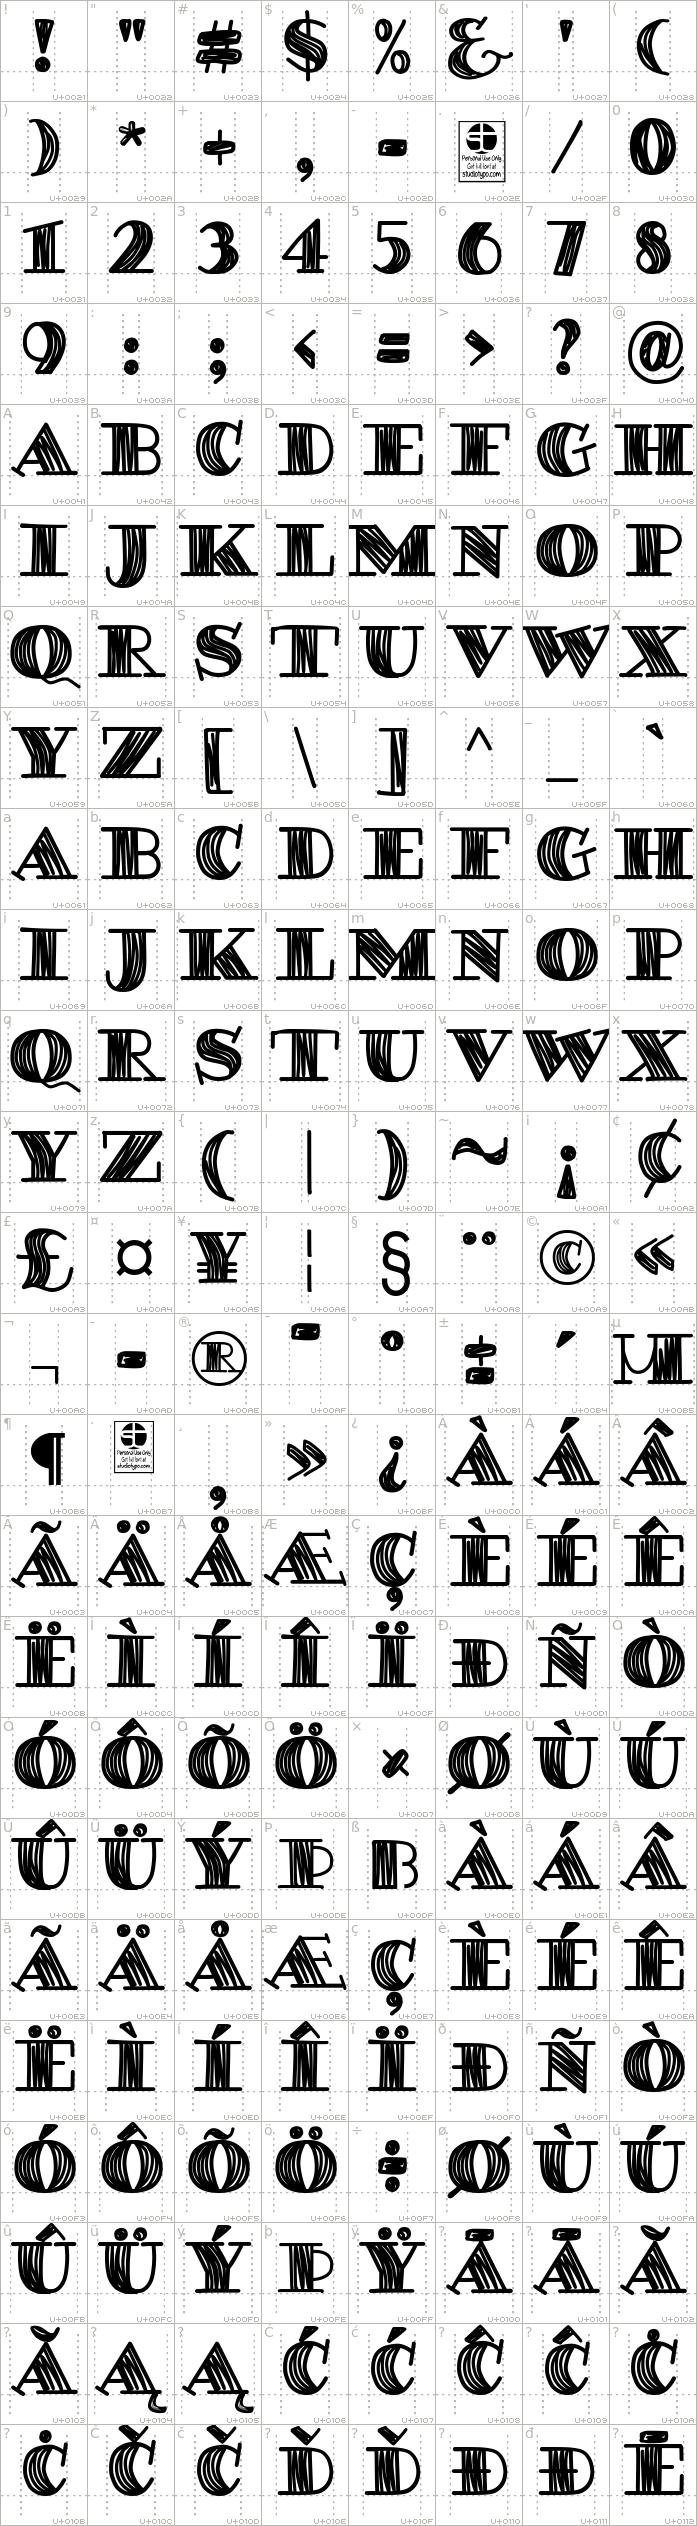 degaws-demo.regular.character-map-1